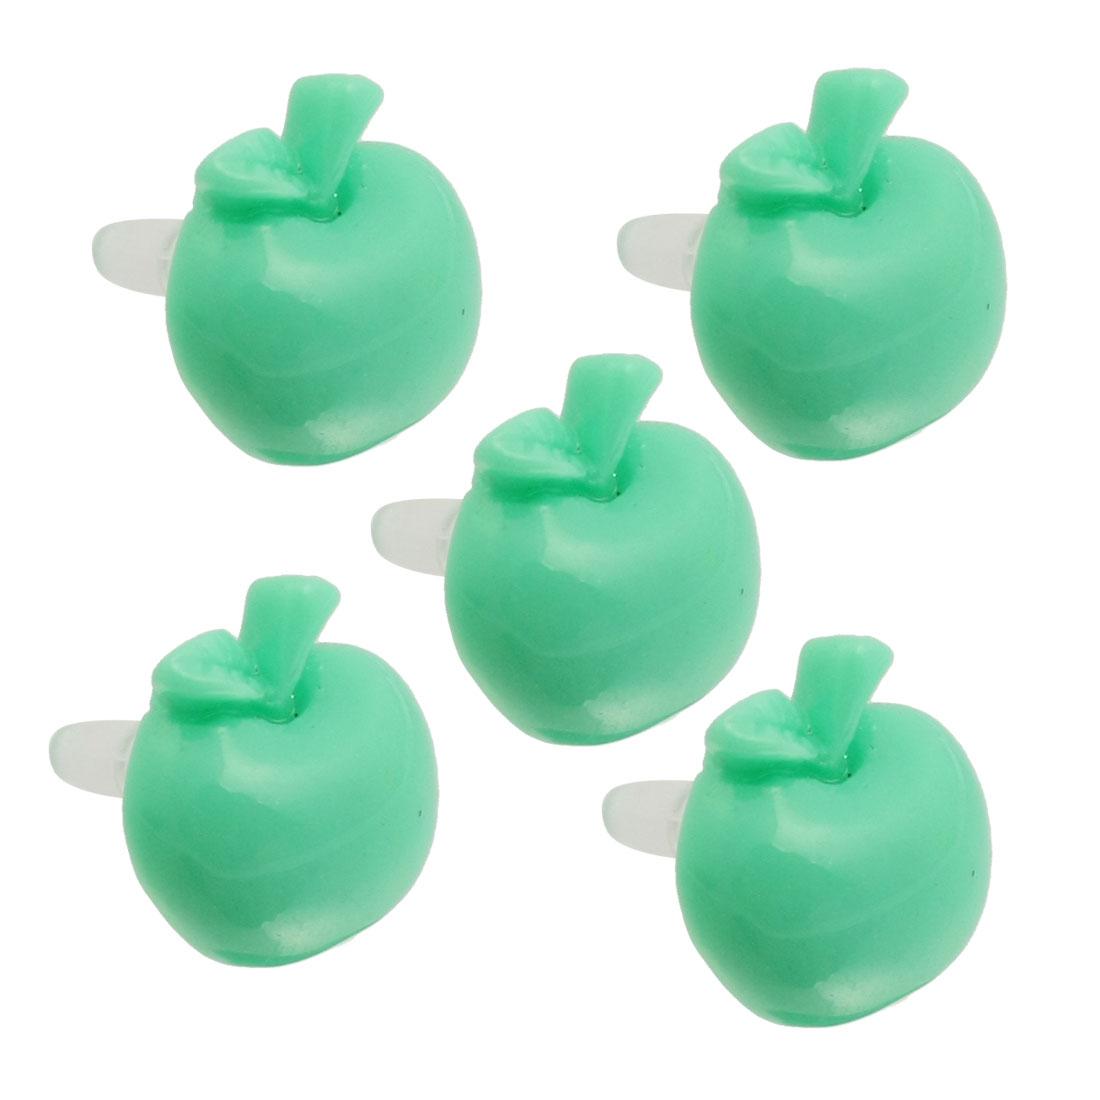 5 Pcs Aqua Green Apple 3.5mm Ear Cap Anti Dust Connector Stopper for iPhone 5G 3G 4S